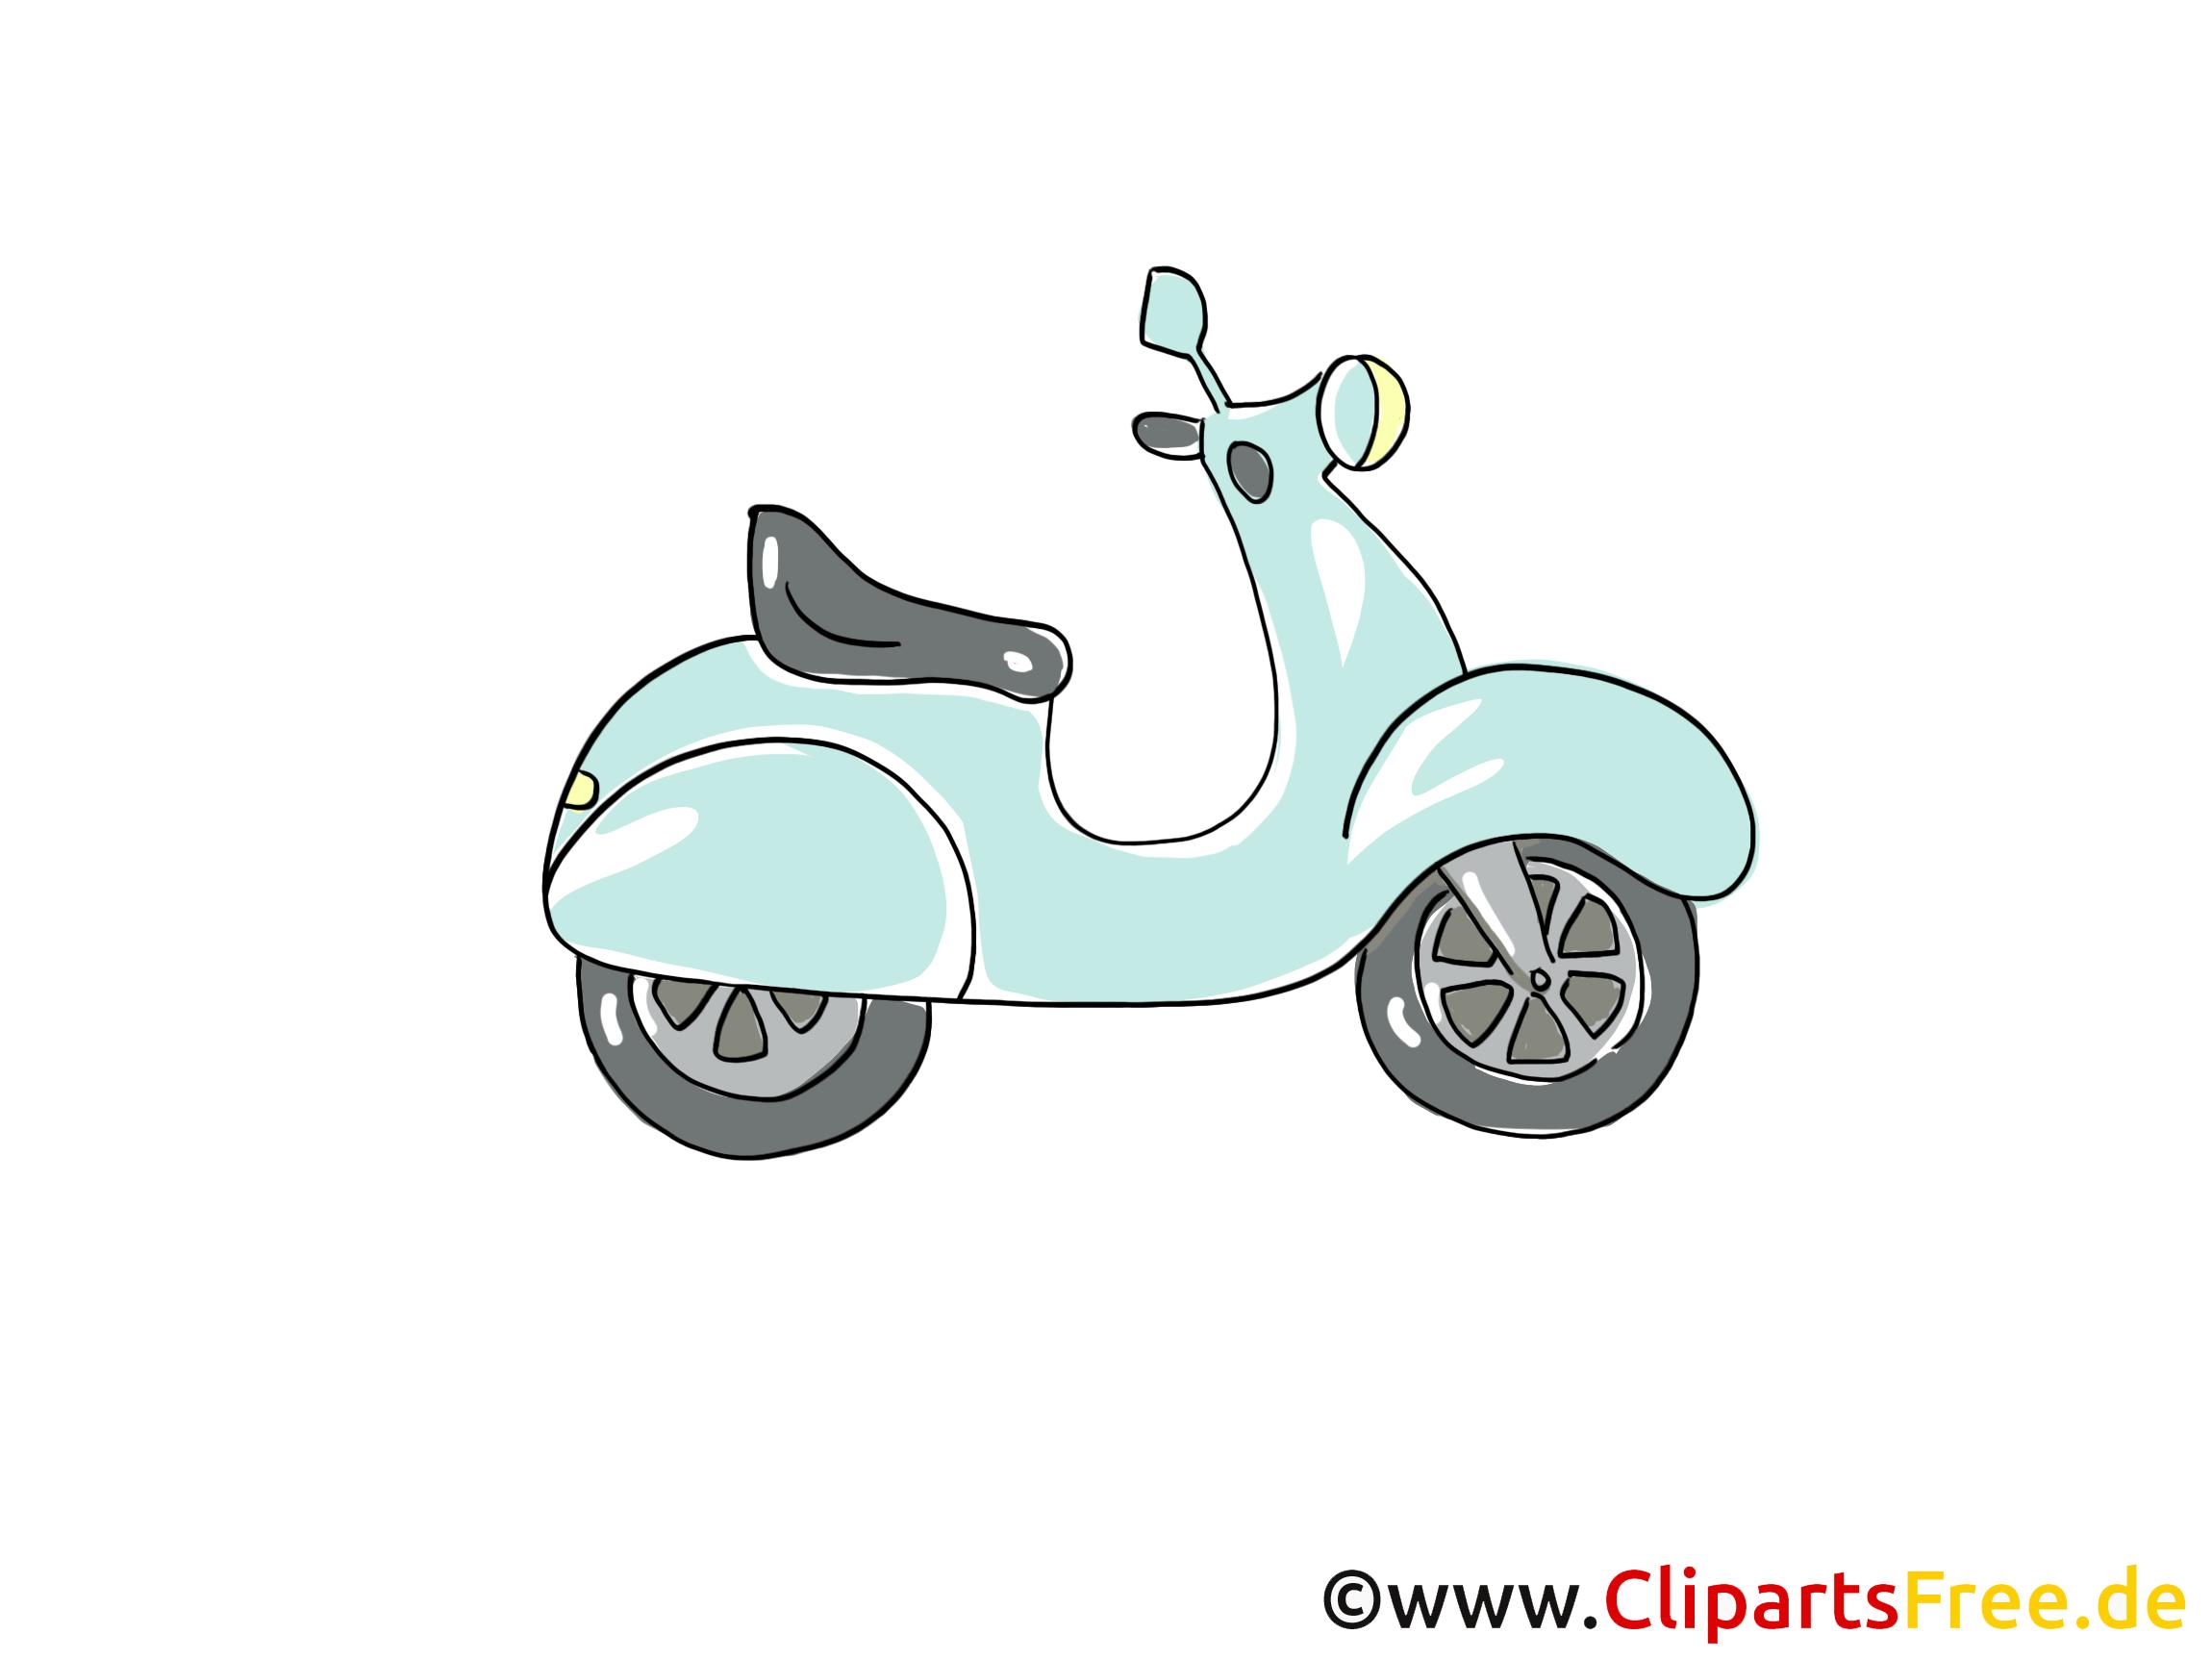 Mofa Clipart, Bild, Cartoon, Comic, Grafik